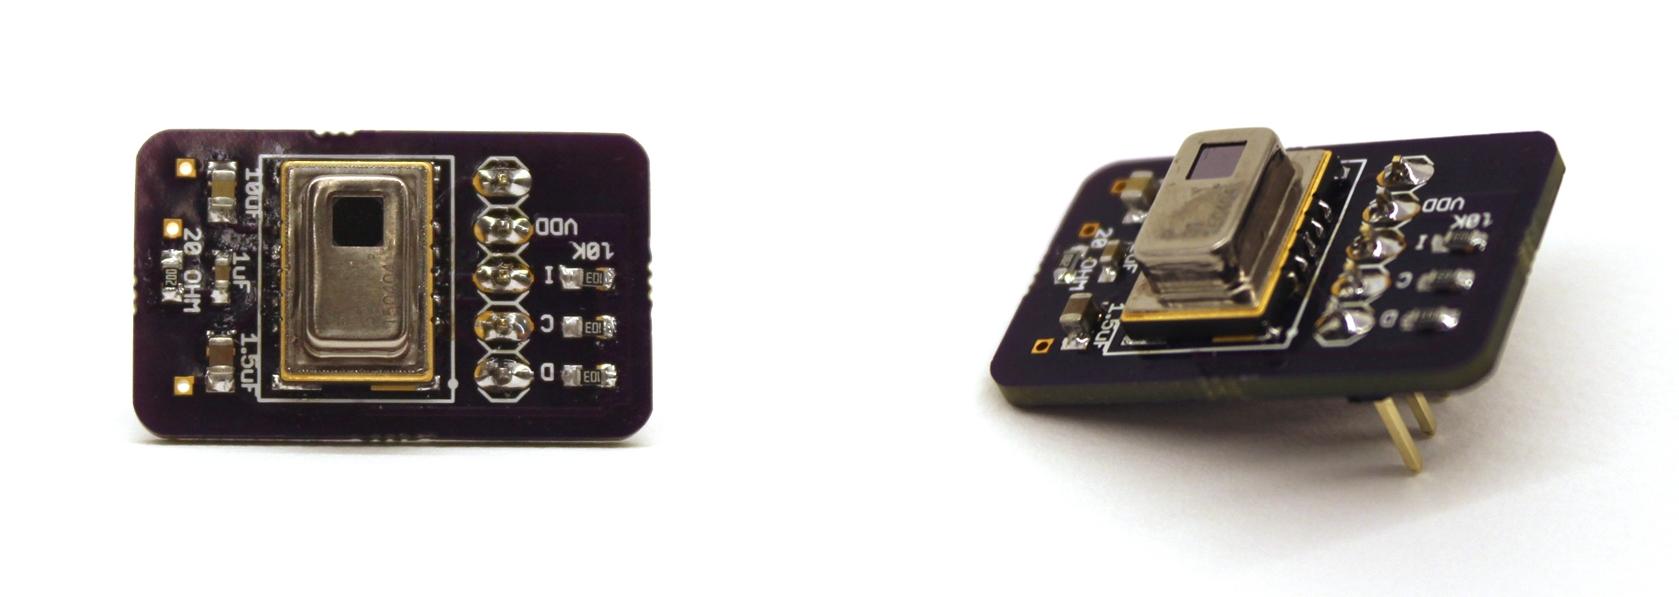 Infrared array sensor and its custom PCB.